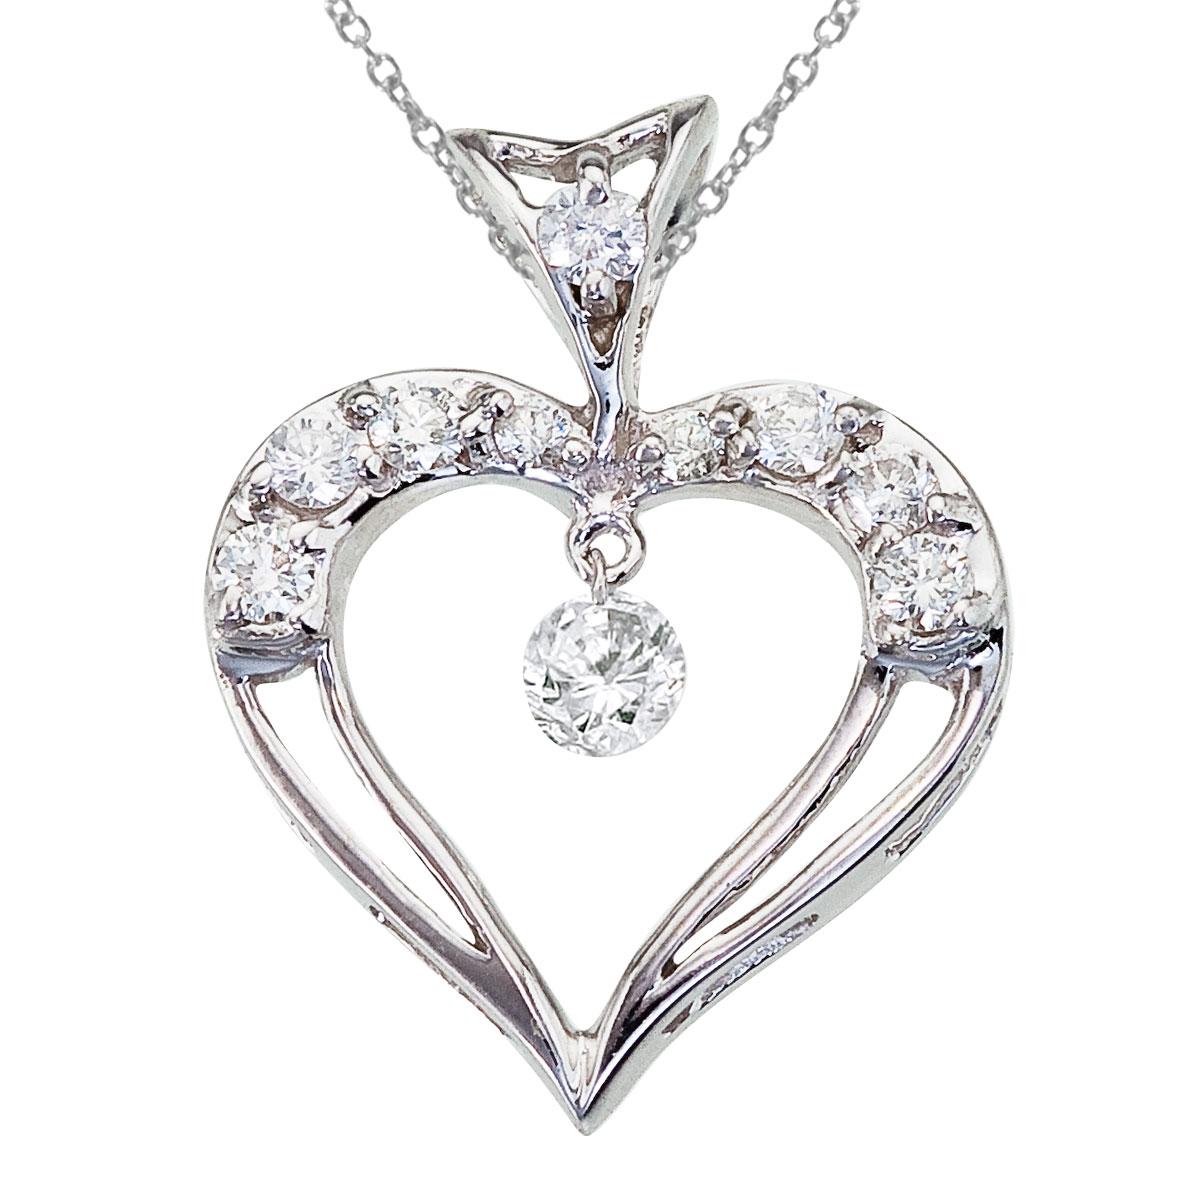 JCX2948: 14K White Gold Dashing Diamond Heart Pendant Watch as the diamonds dangle  glitter and sparkle in the setting!